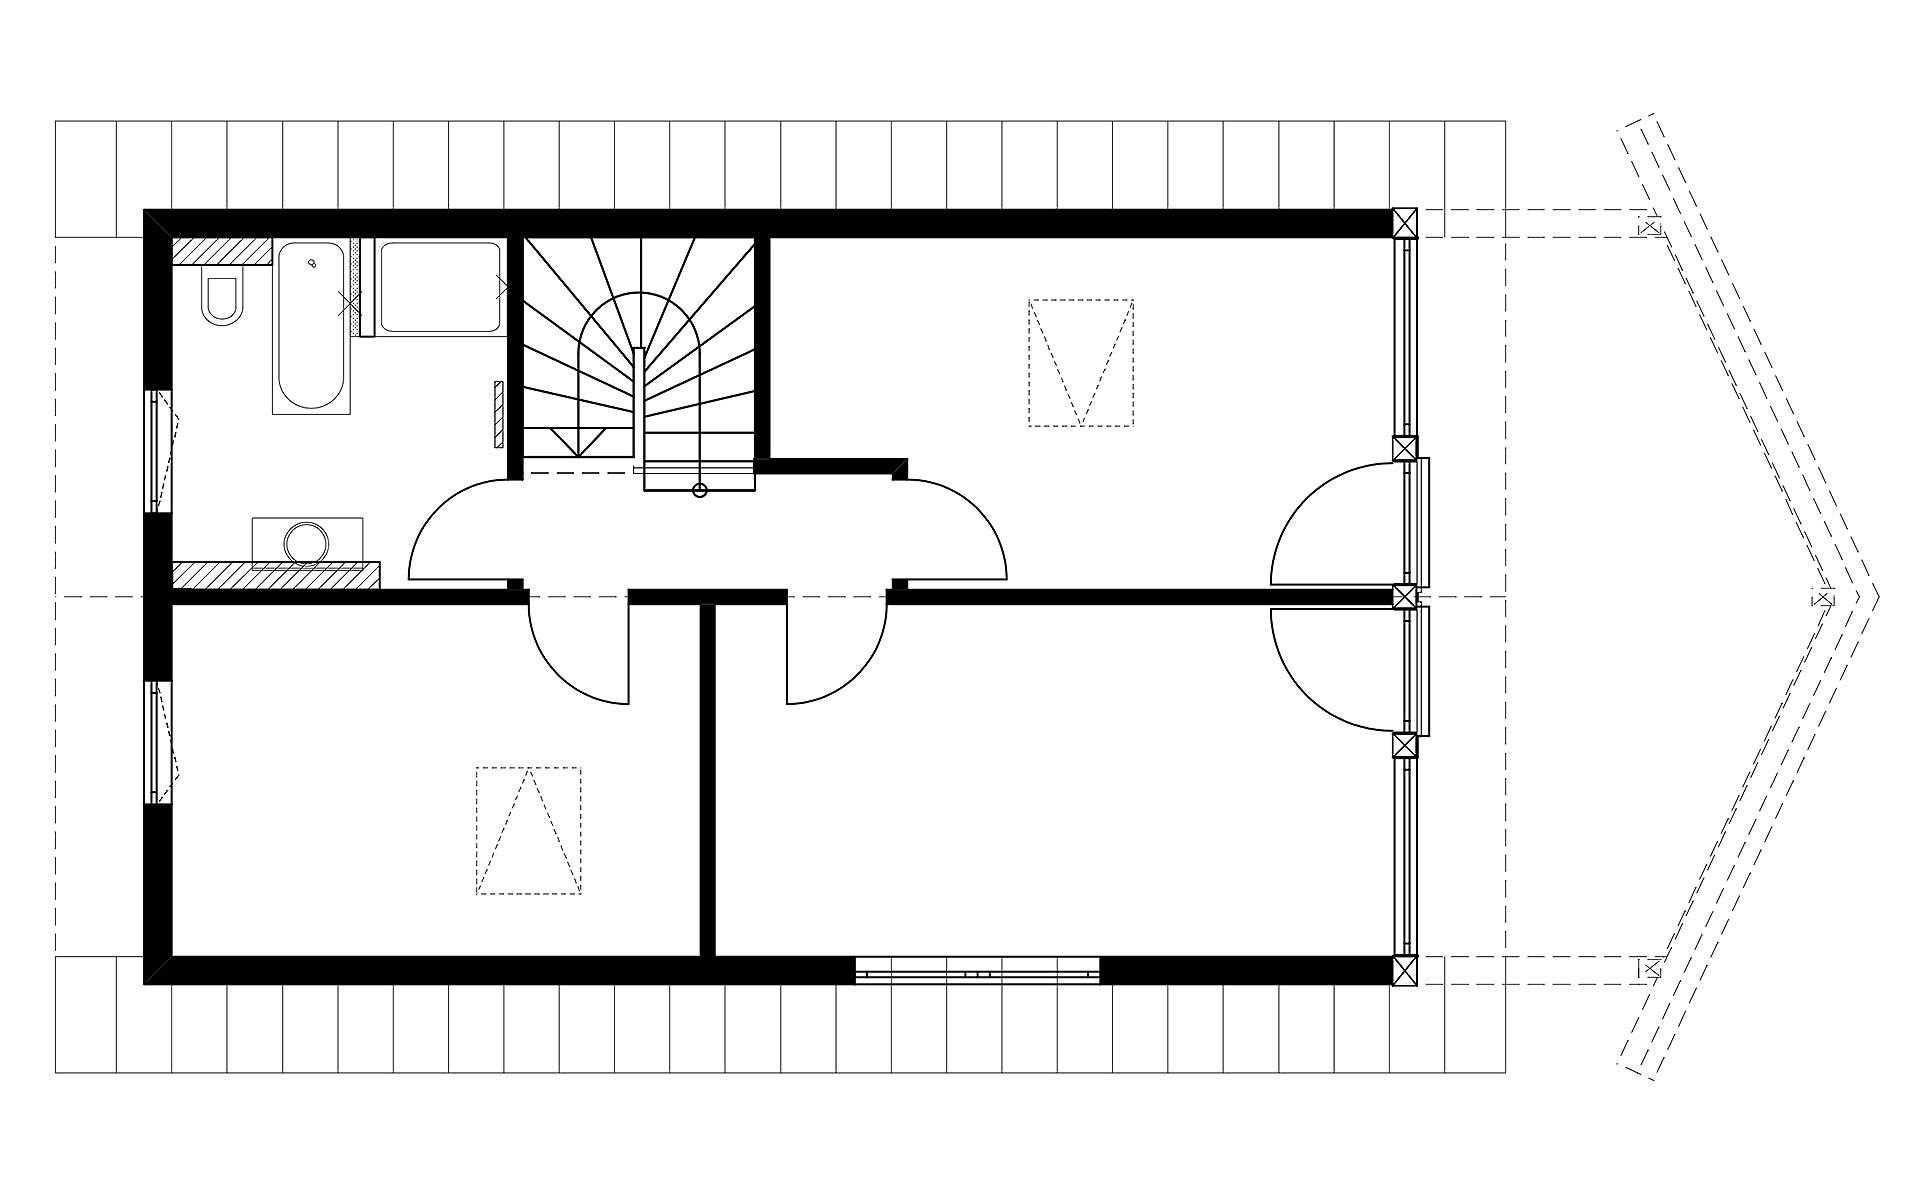 Dachgeschoss Homestory 901 von Lehner-Haus GmbH